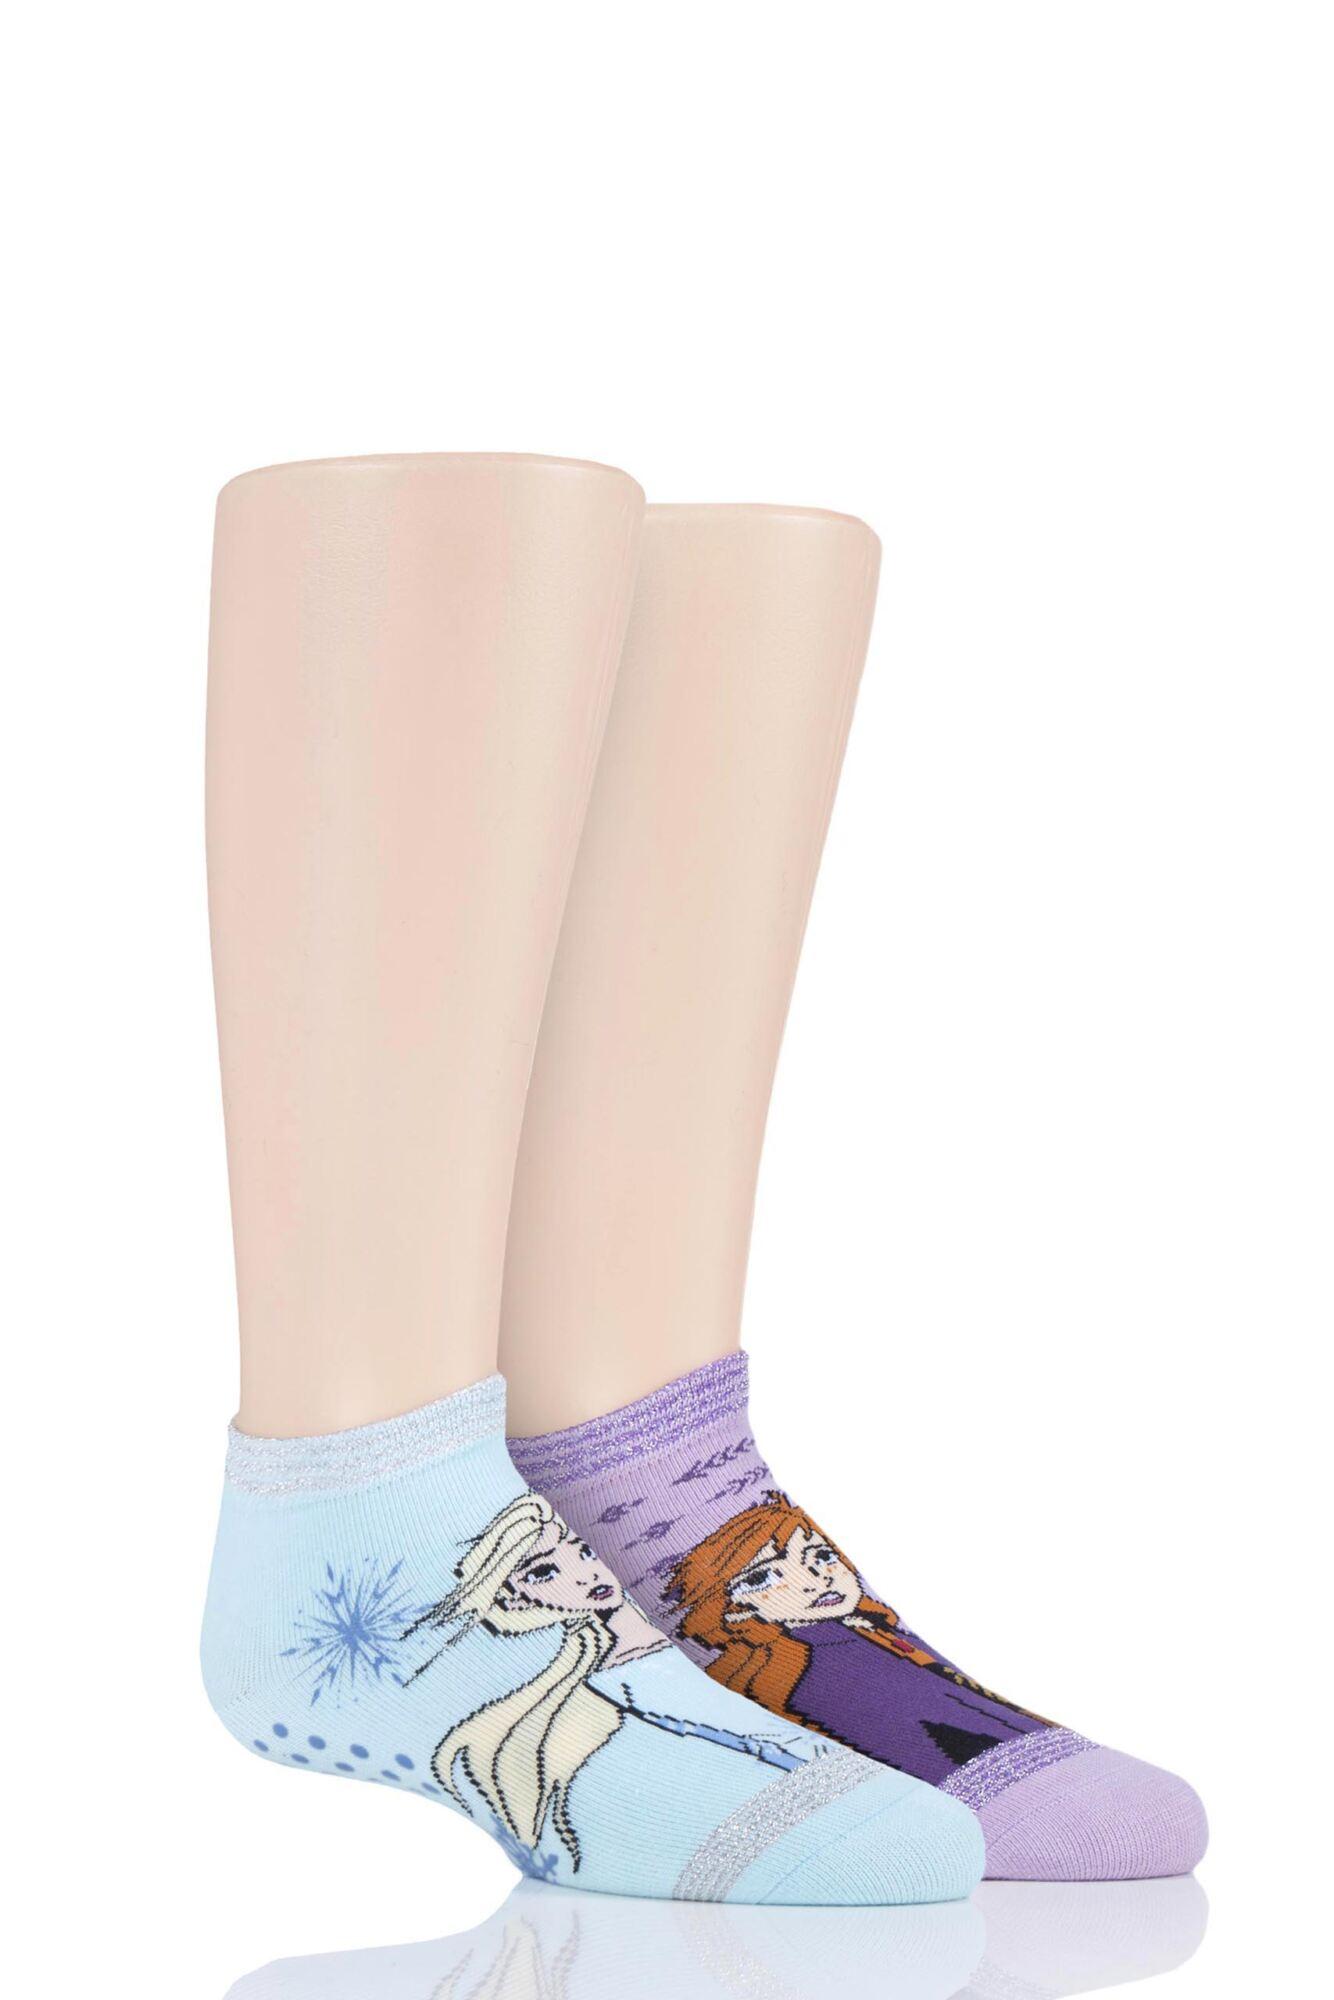 2 Pair with Disney Tiny Soles Frozen Gripper Socks Kids Unisex - Tavi Noir